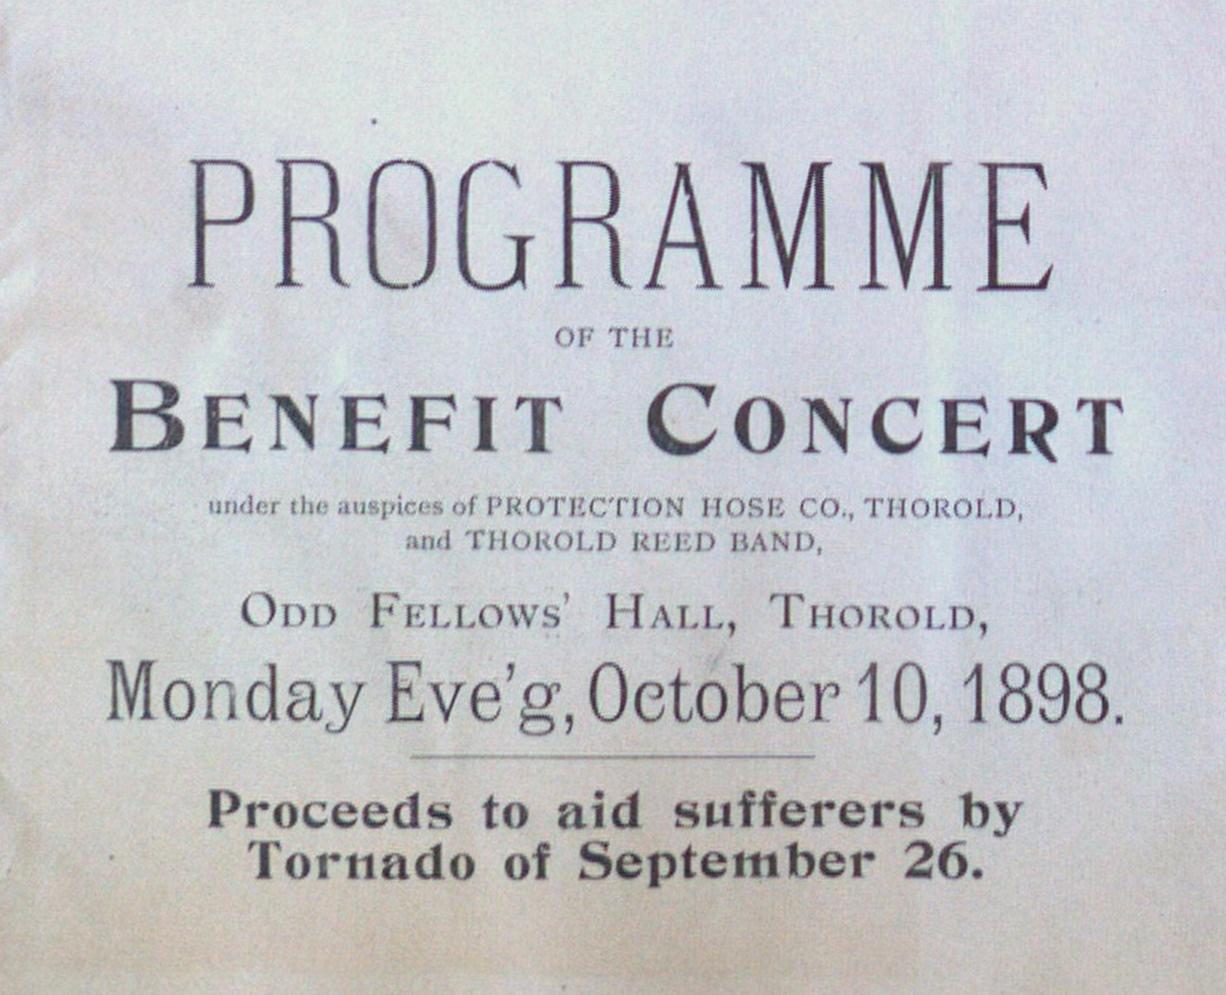 Teresa Vanderburgh's Musical Scrapbook #1 - Benefit Concert Program for September 26 Tornado Sufferers